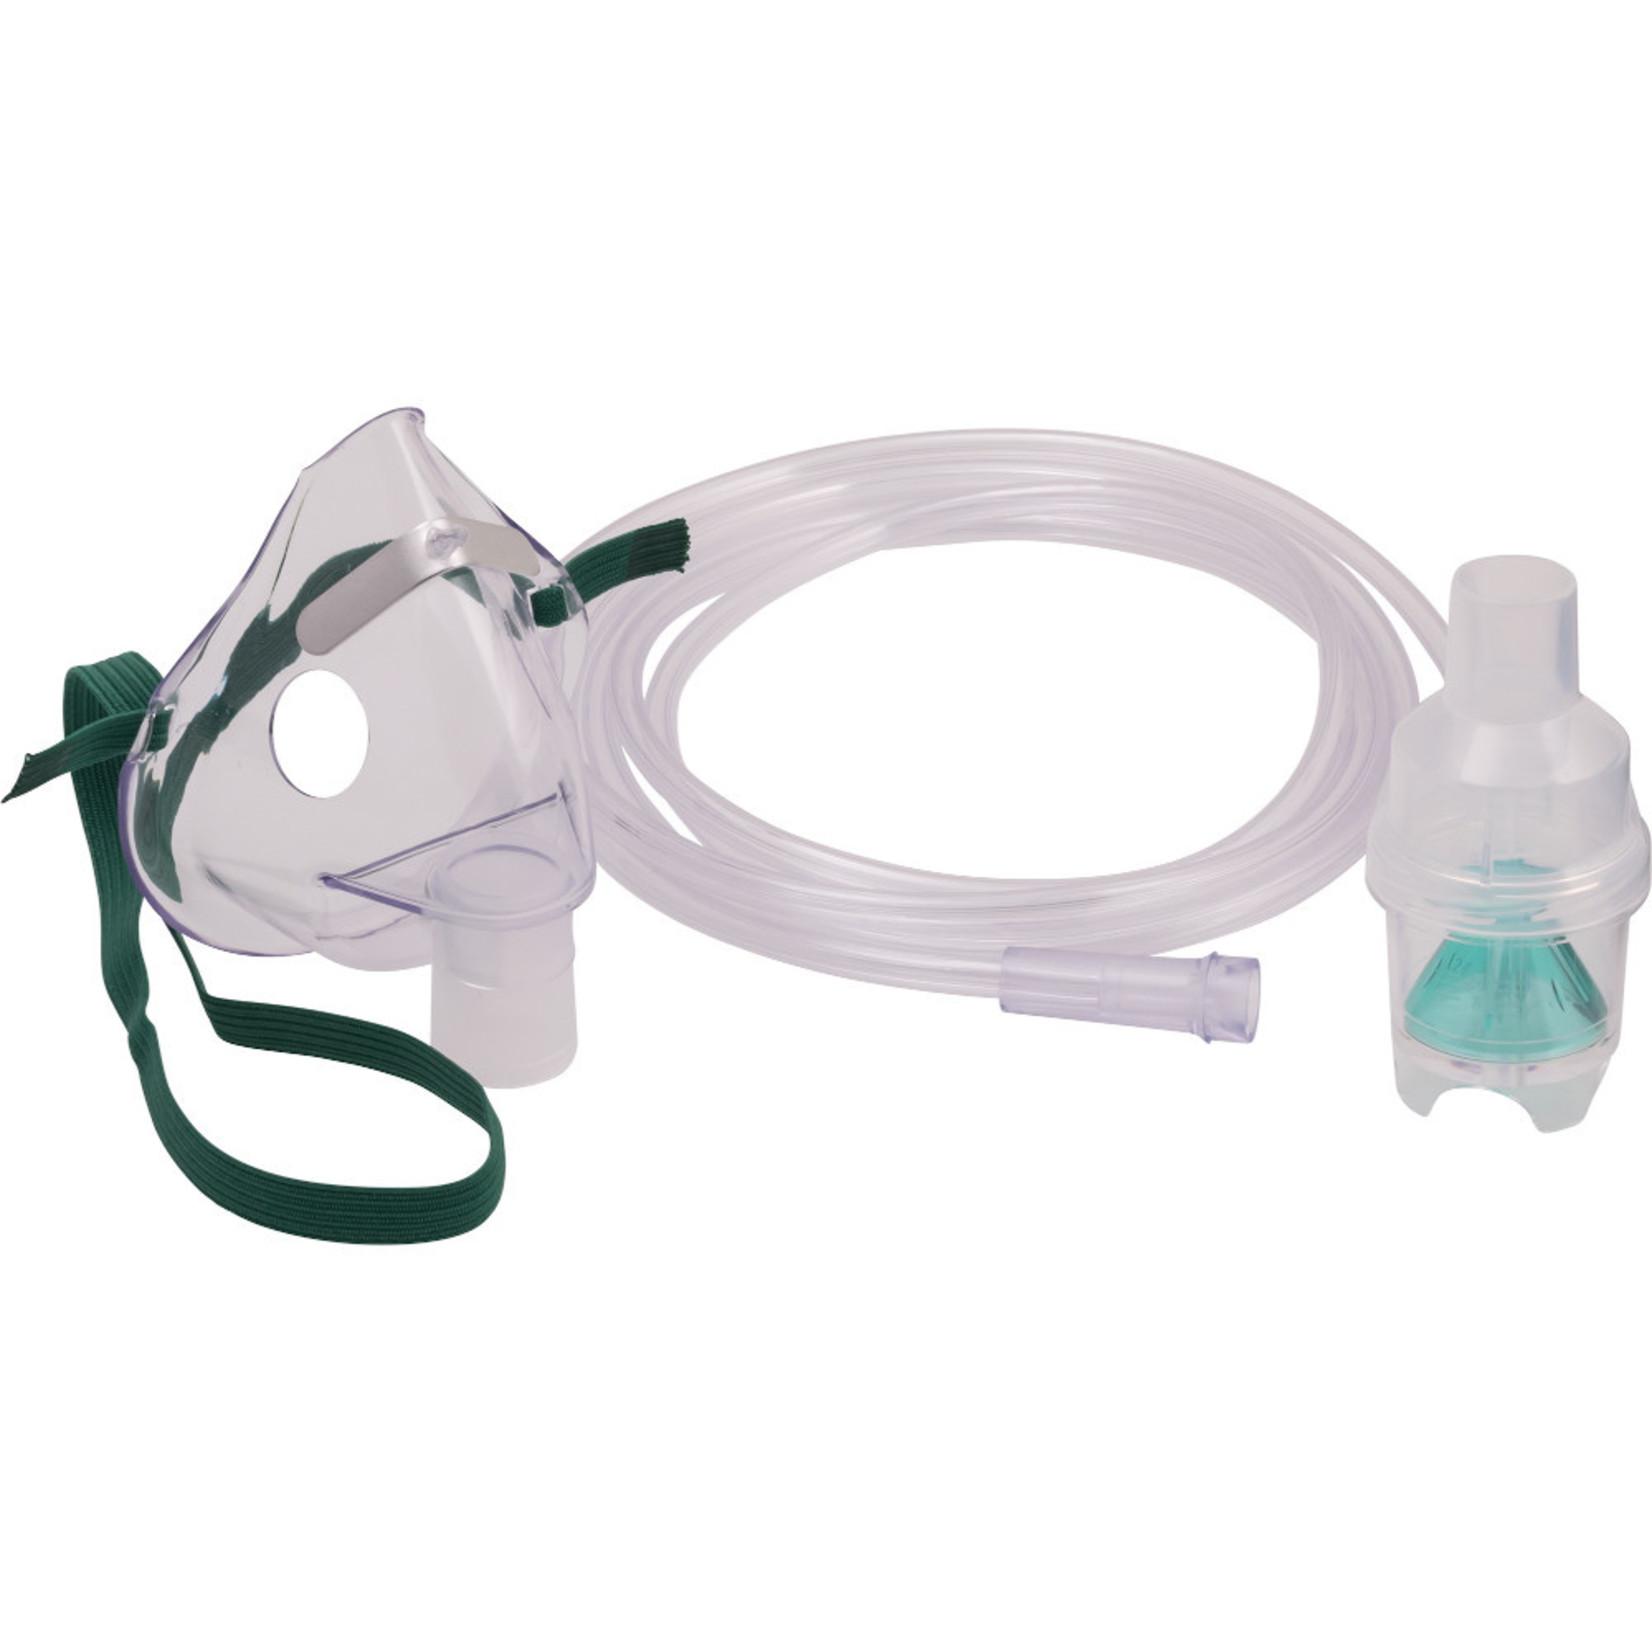 Nebulizer Mask - Pediatric